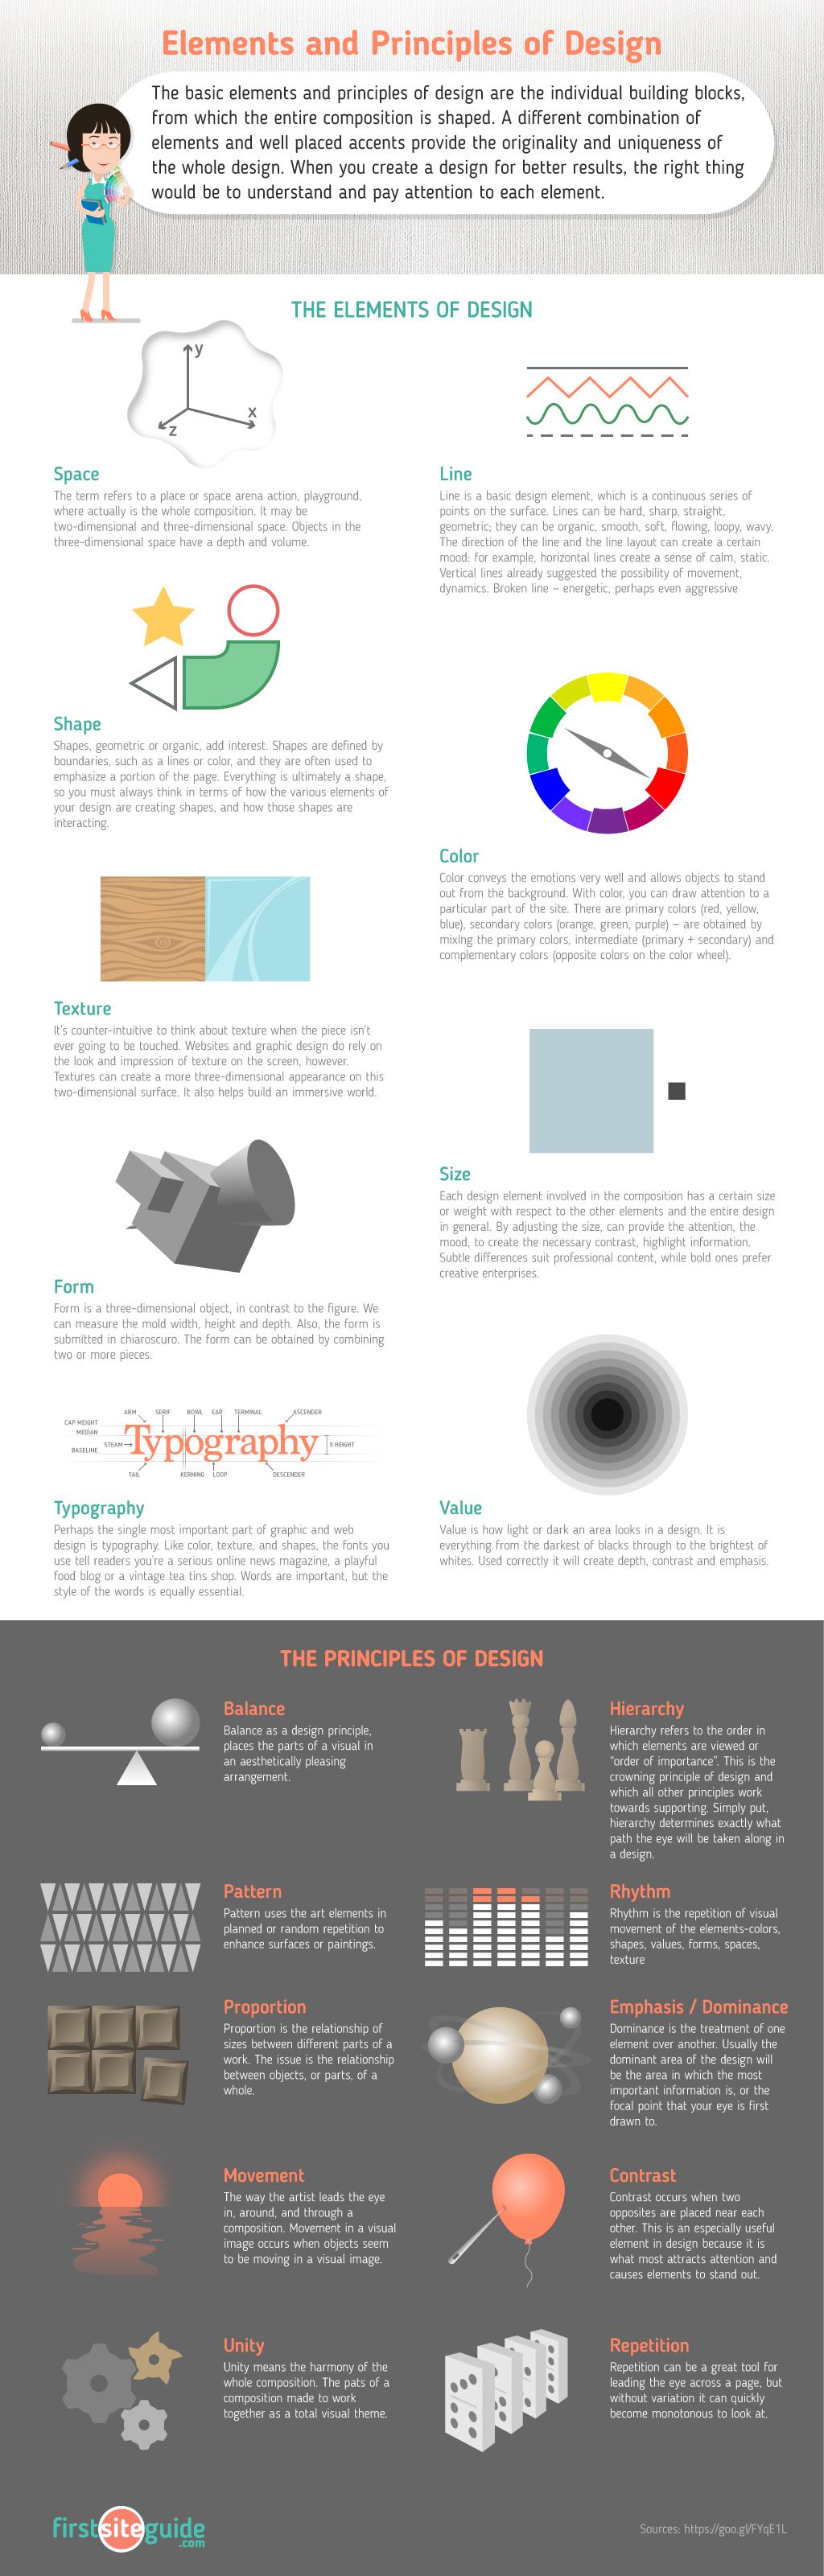 Design Principles Cheat Sheet